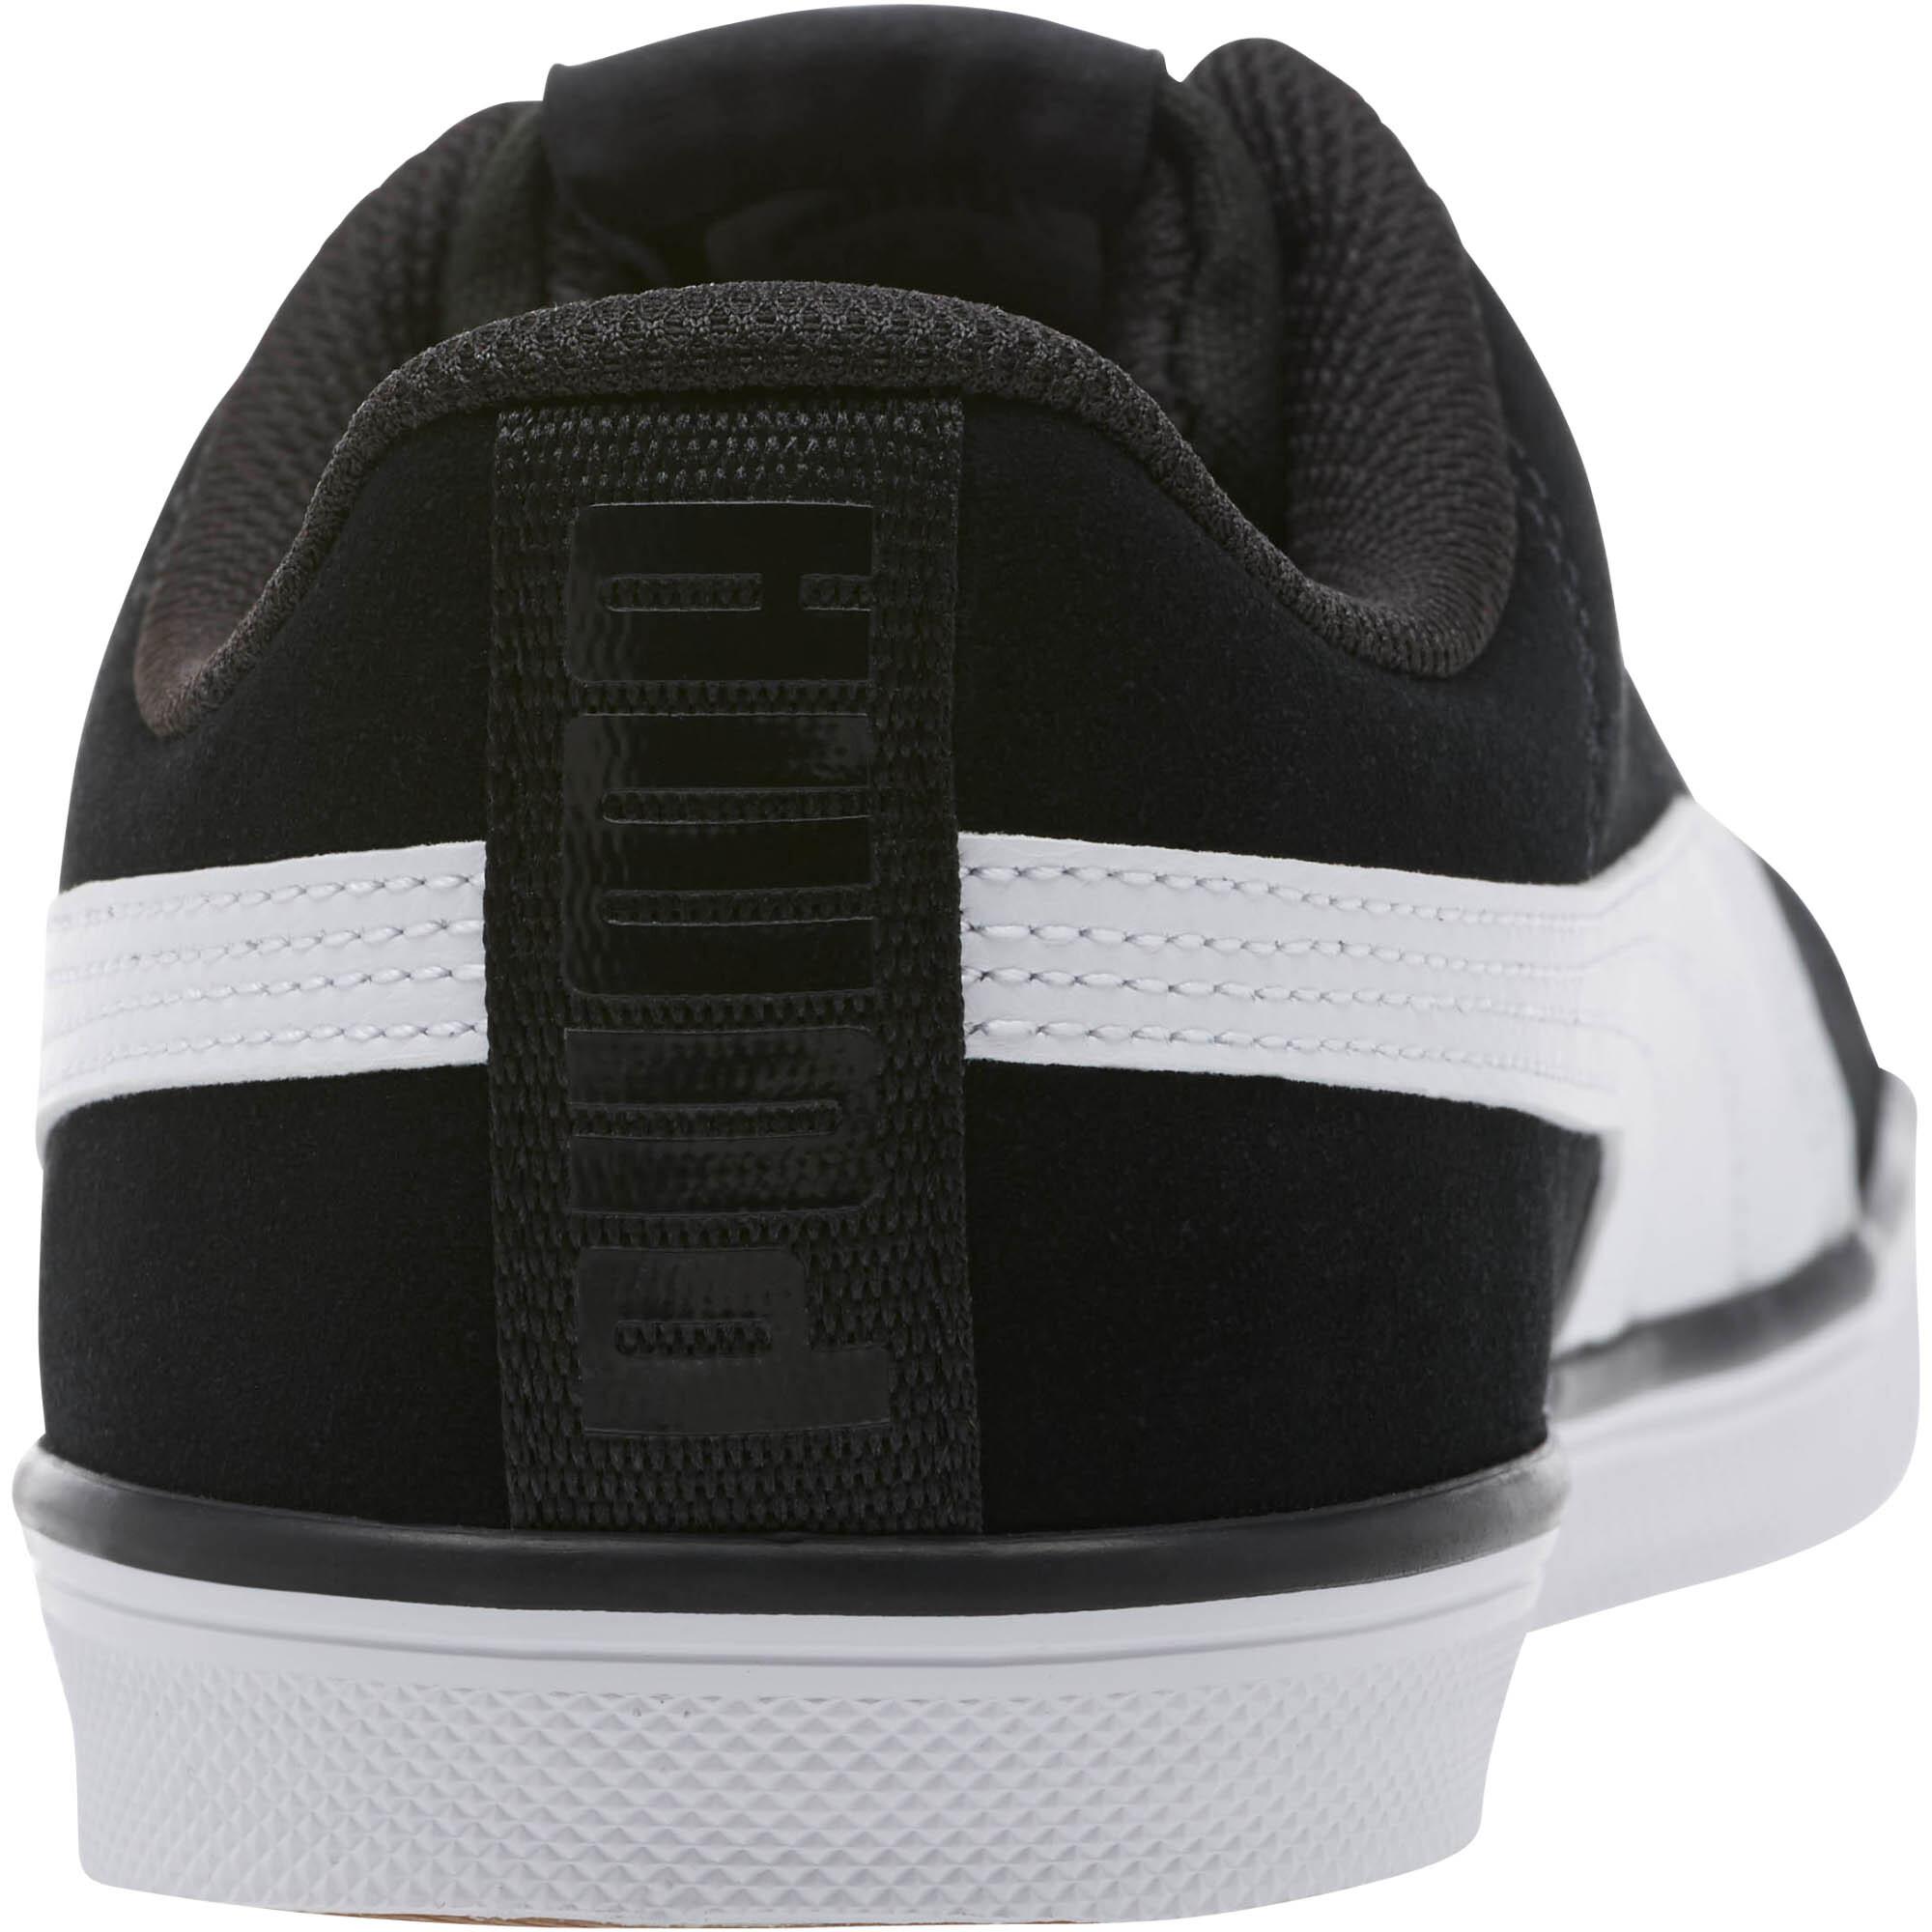 PUMA-Urban-Plus-Suede-Sneakers-Men-Shoe-Basics thumbnail 17